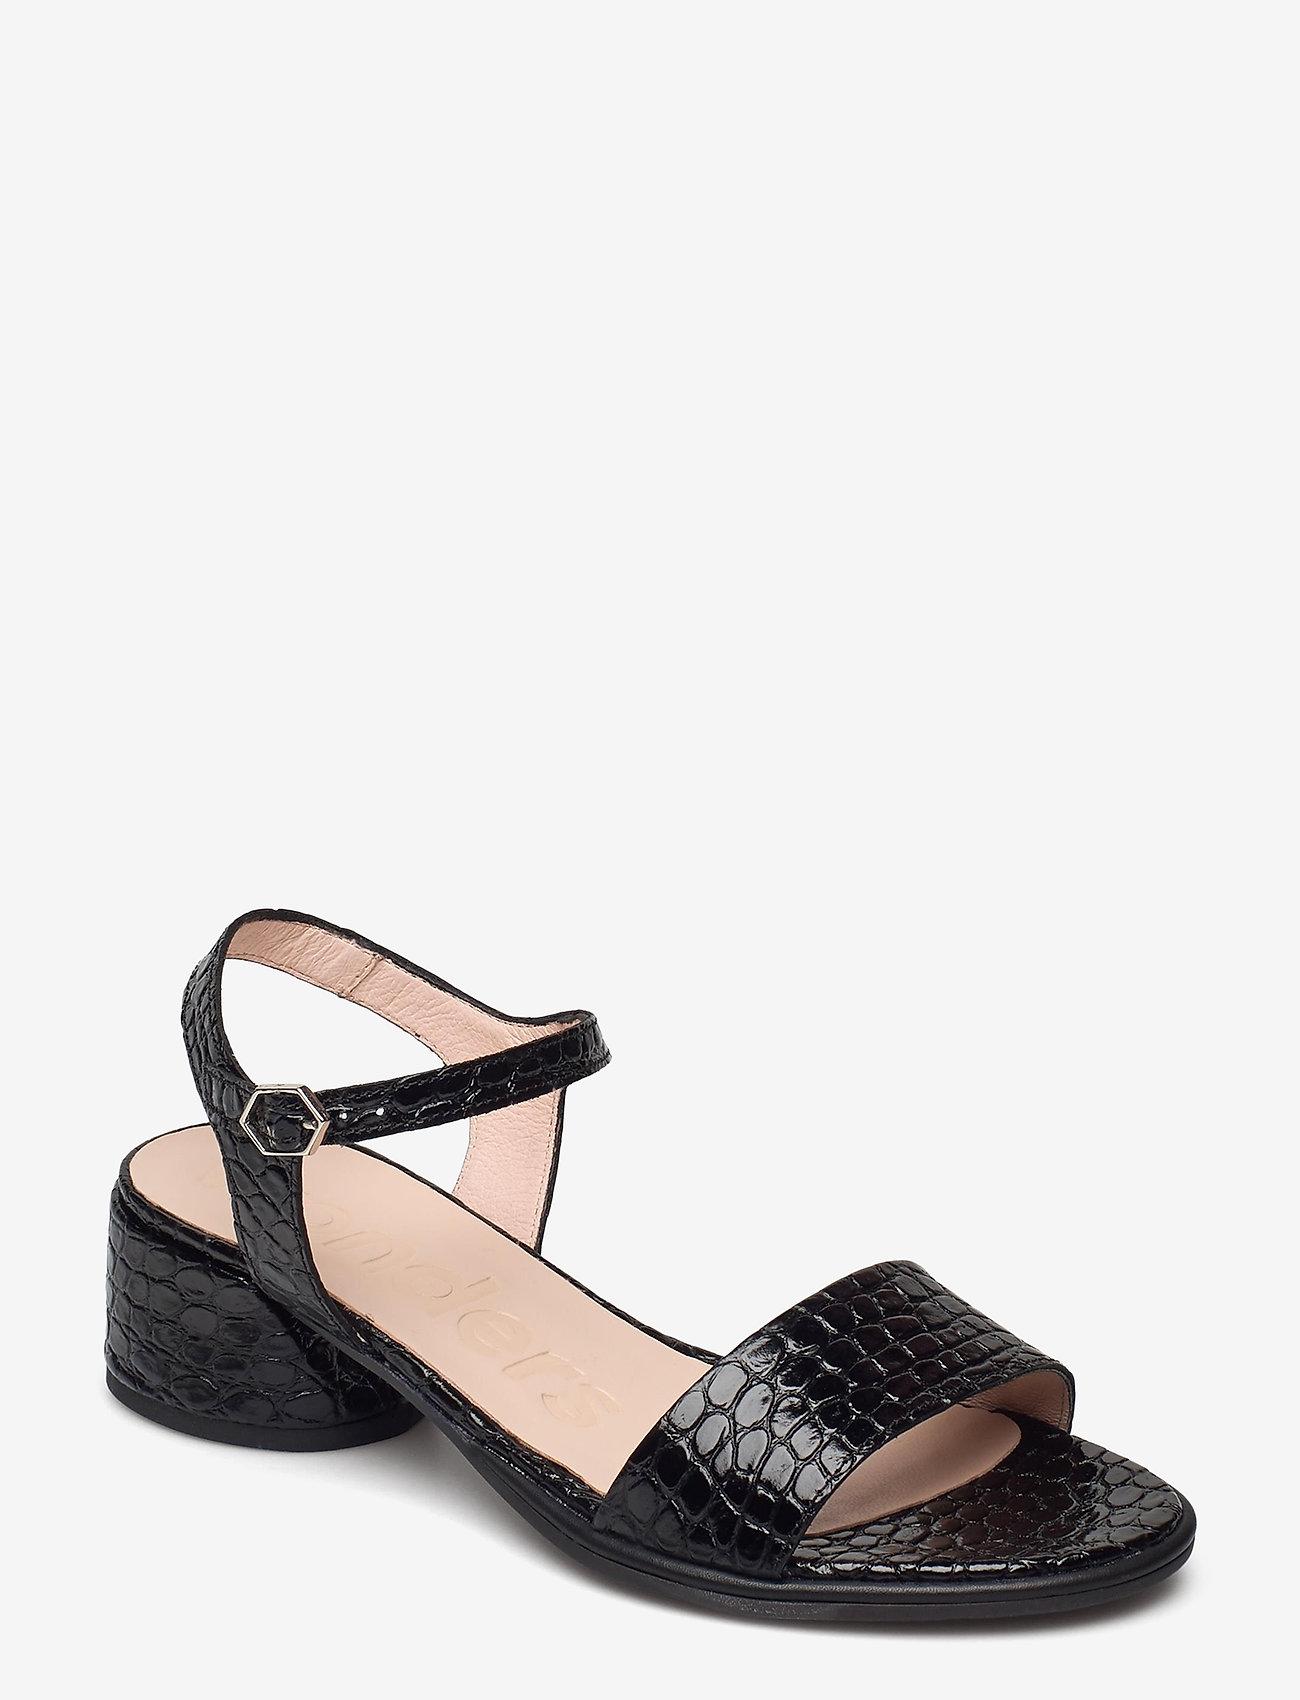 Wonders - B-7301 FIANCHI/IS - högklackade sandaler - black - 0